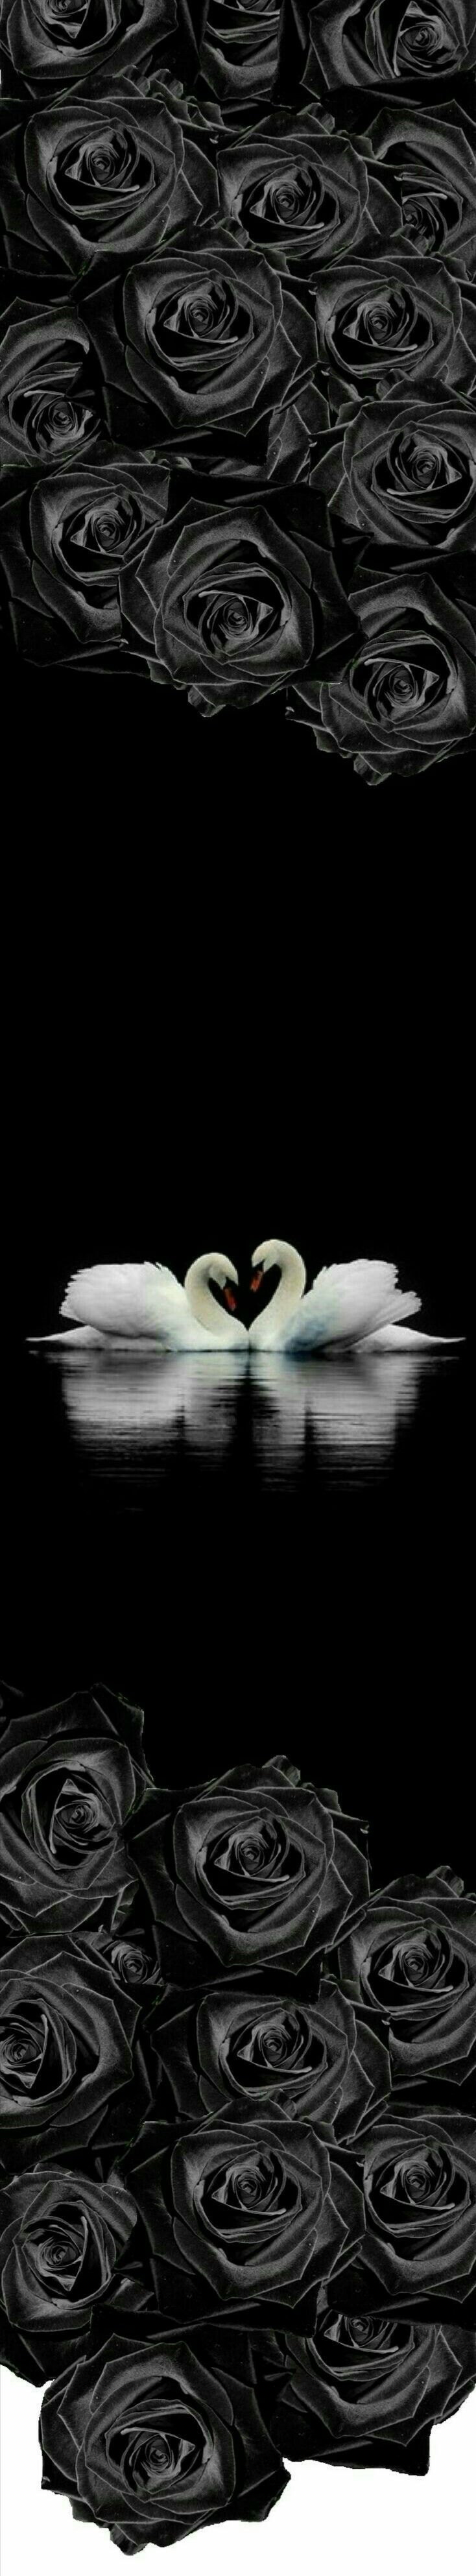 113 best Swans images on Pinterest